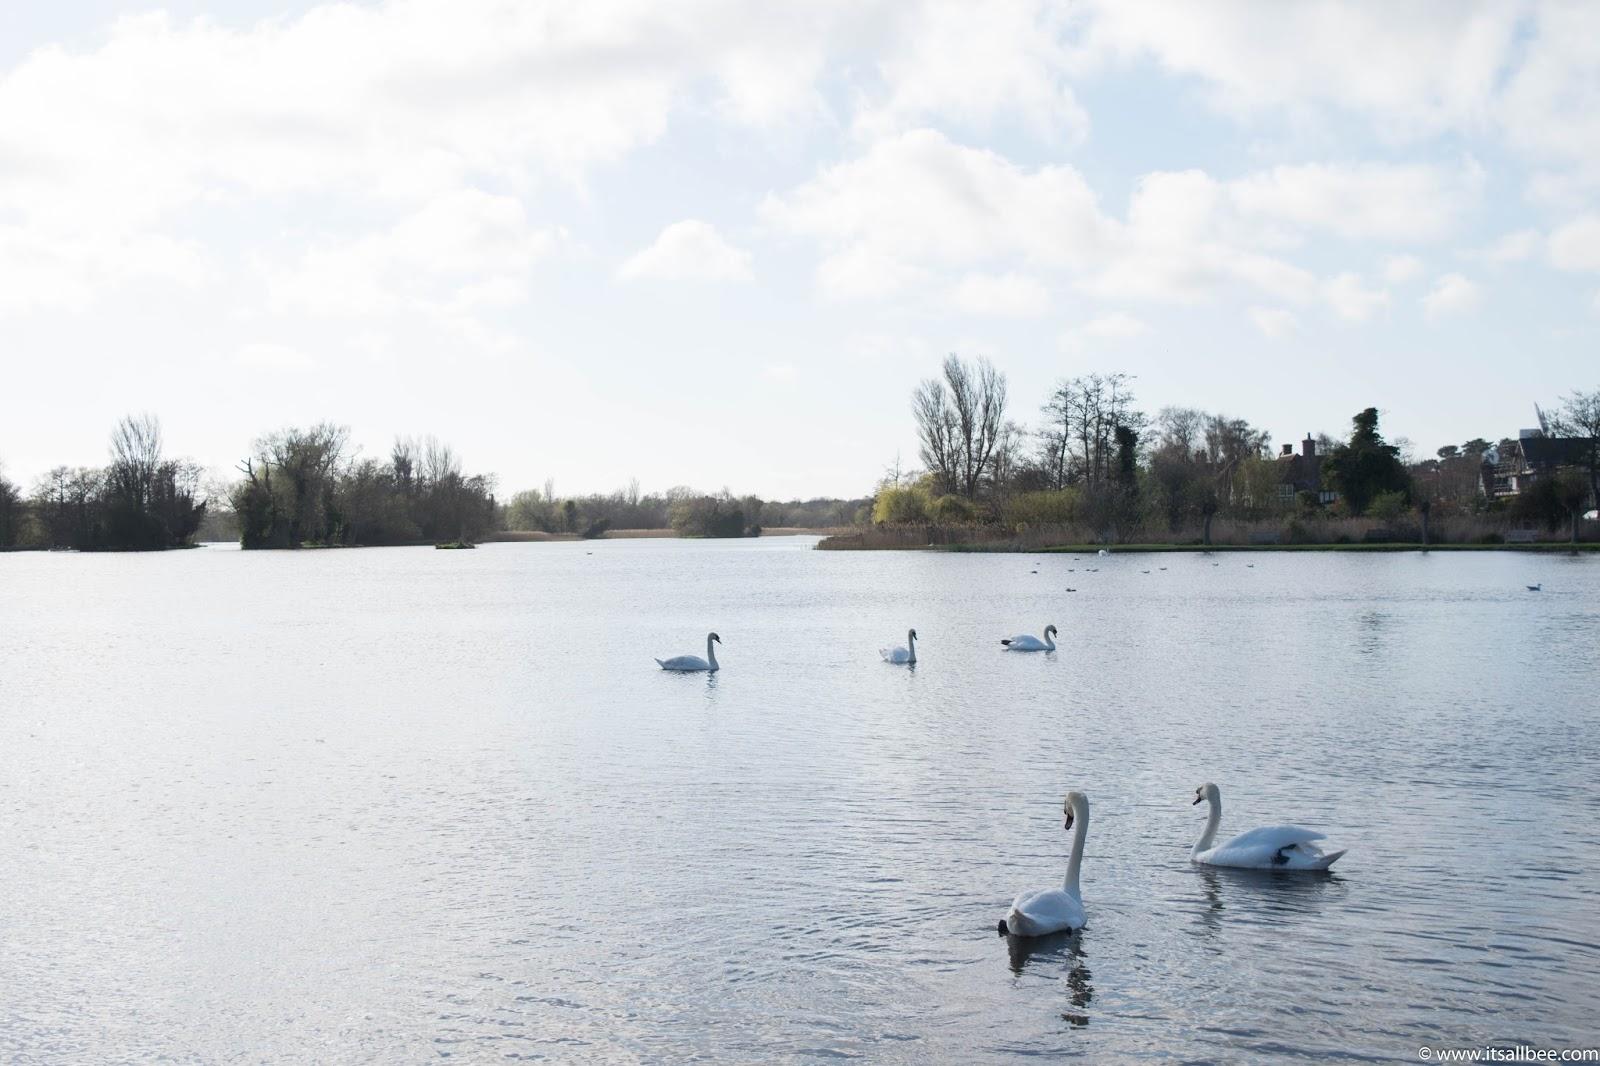 Thorpeness Lake | Thorpeness Boating Lake | Thorpeness Lake | Thorpeness Village